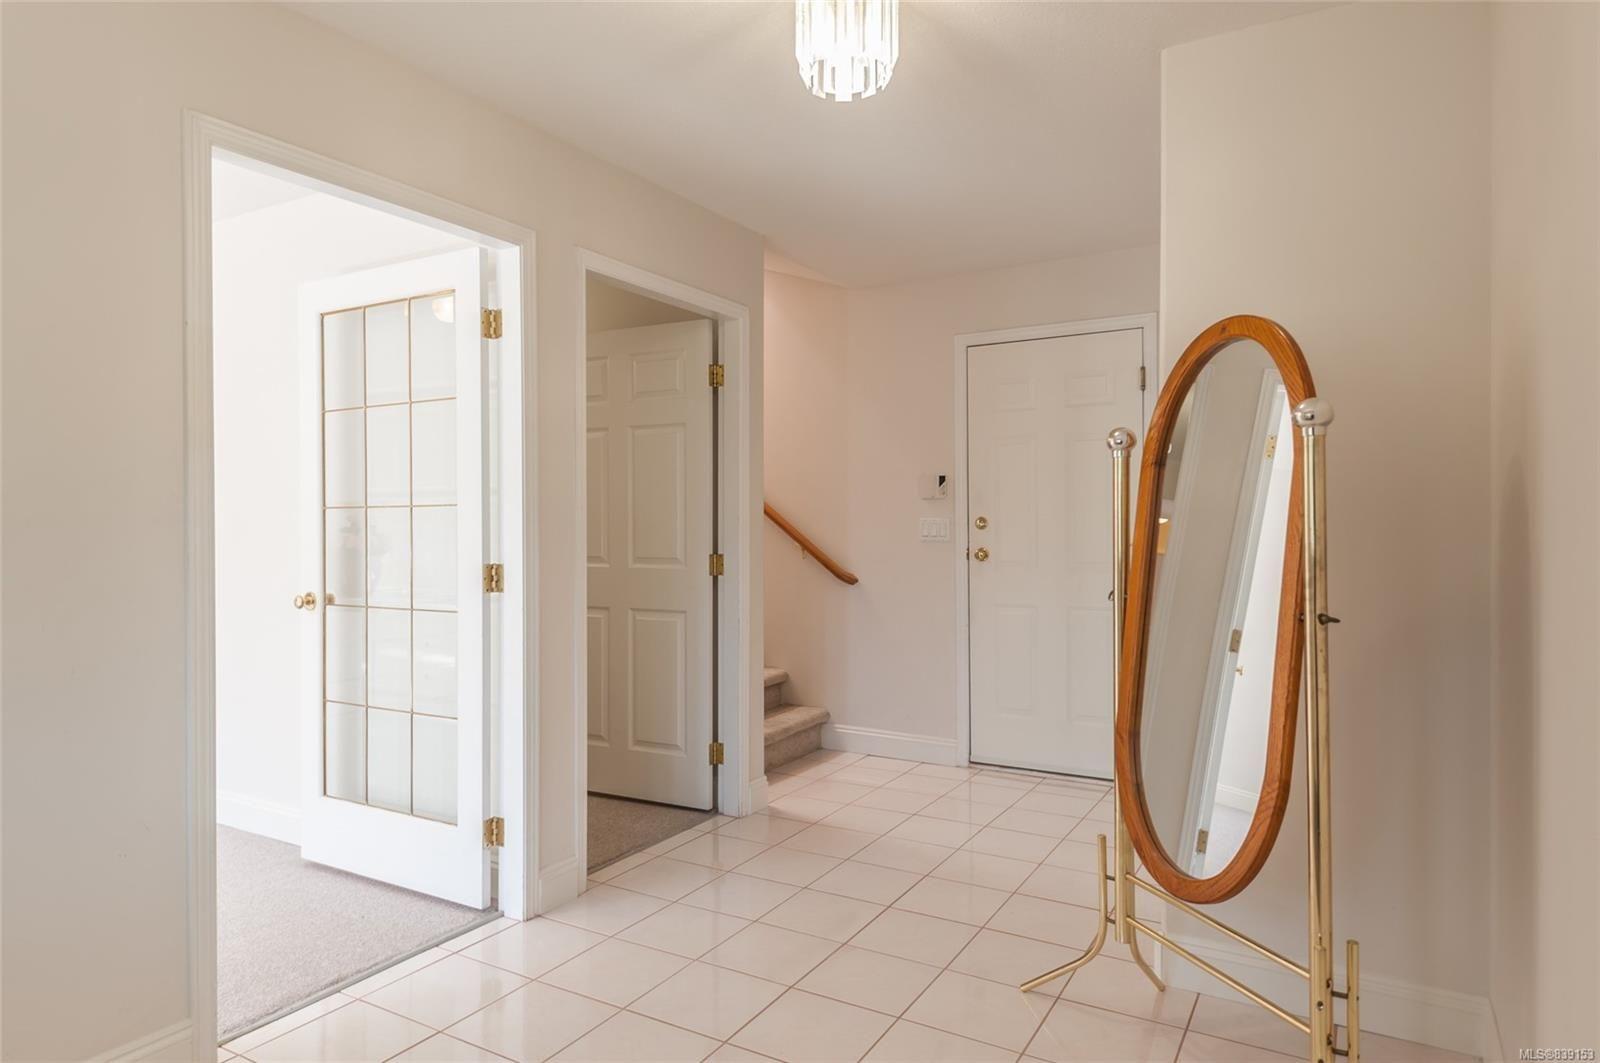 Photo 52: Photos: 6412 Dover Rd in NANAIMO: Na North Nanaimo House for sale (Nanaimo)  : MLS®# 839153